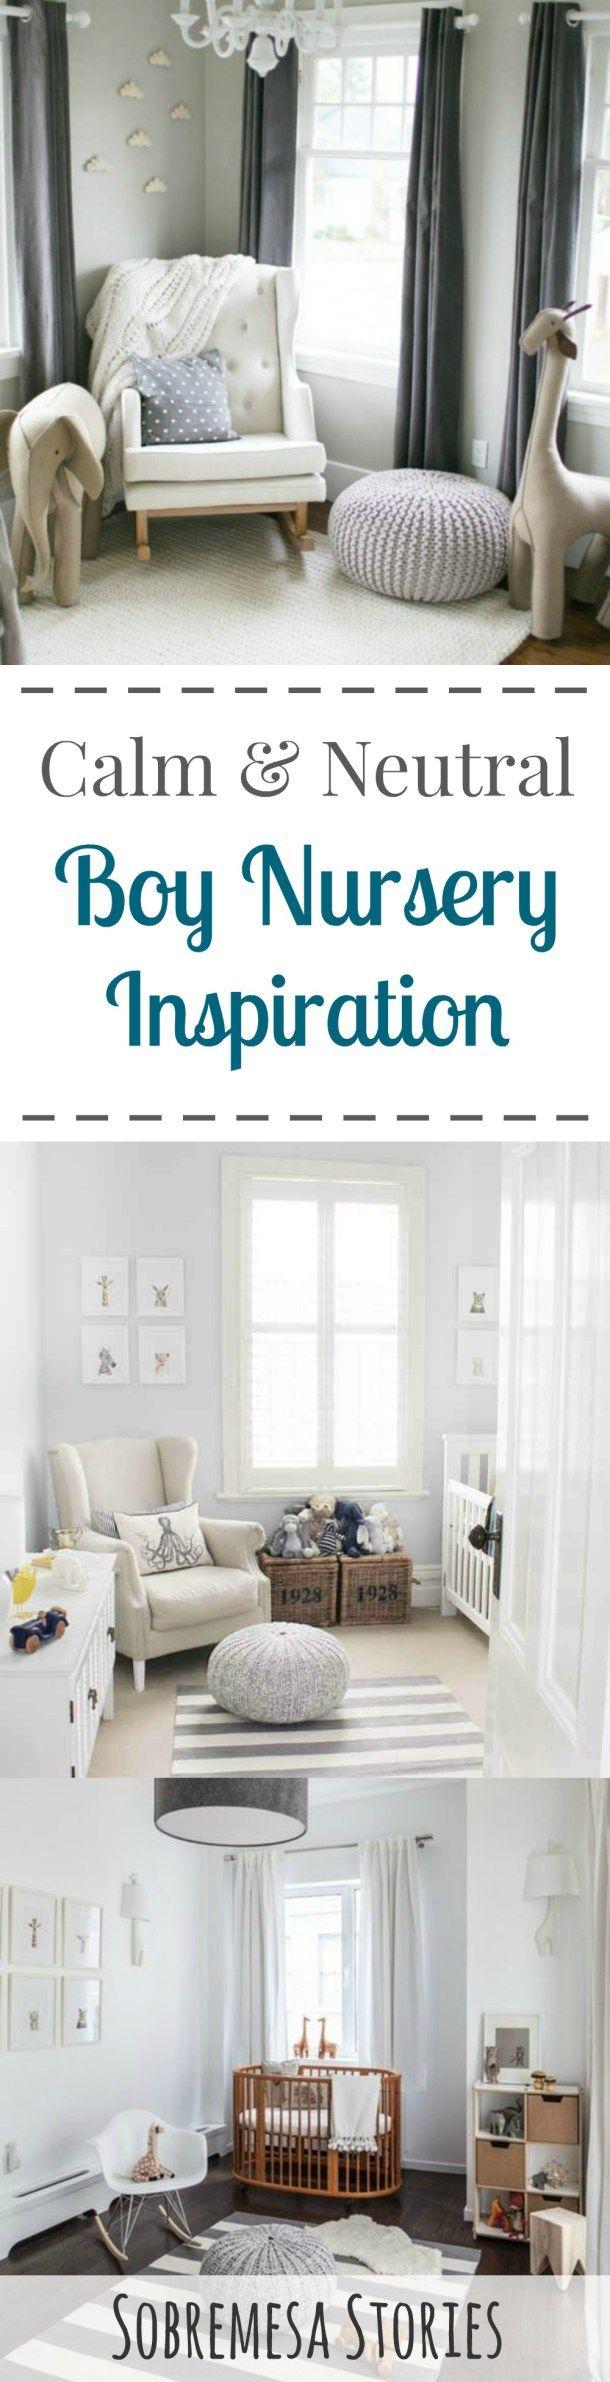 best 20 calming nursery ideas on pinterest baby room nursery gorgeous neutral gray boy nursery ideas perfect if you re expecting a little man